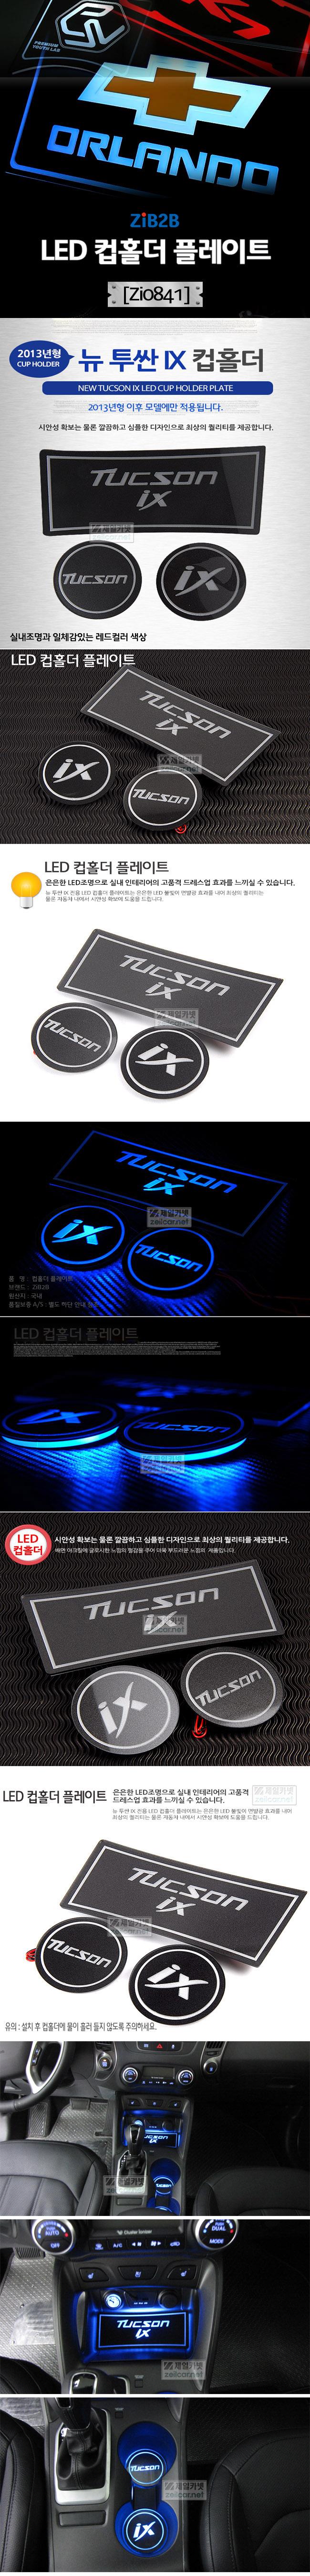 [ZiB2B] 뉴투싼ix (2013년형) 전용 LED 컵홀더 콘솔플레이트 [Zi0841]